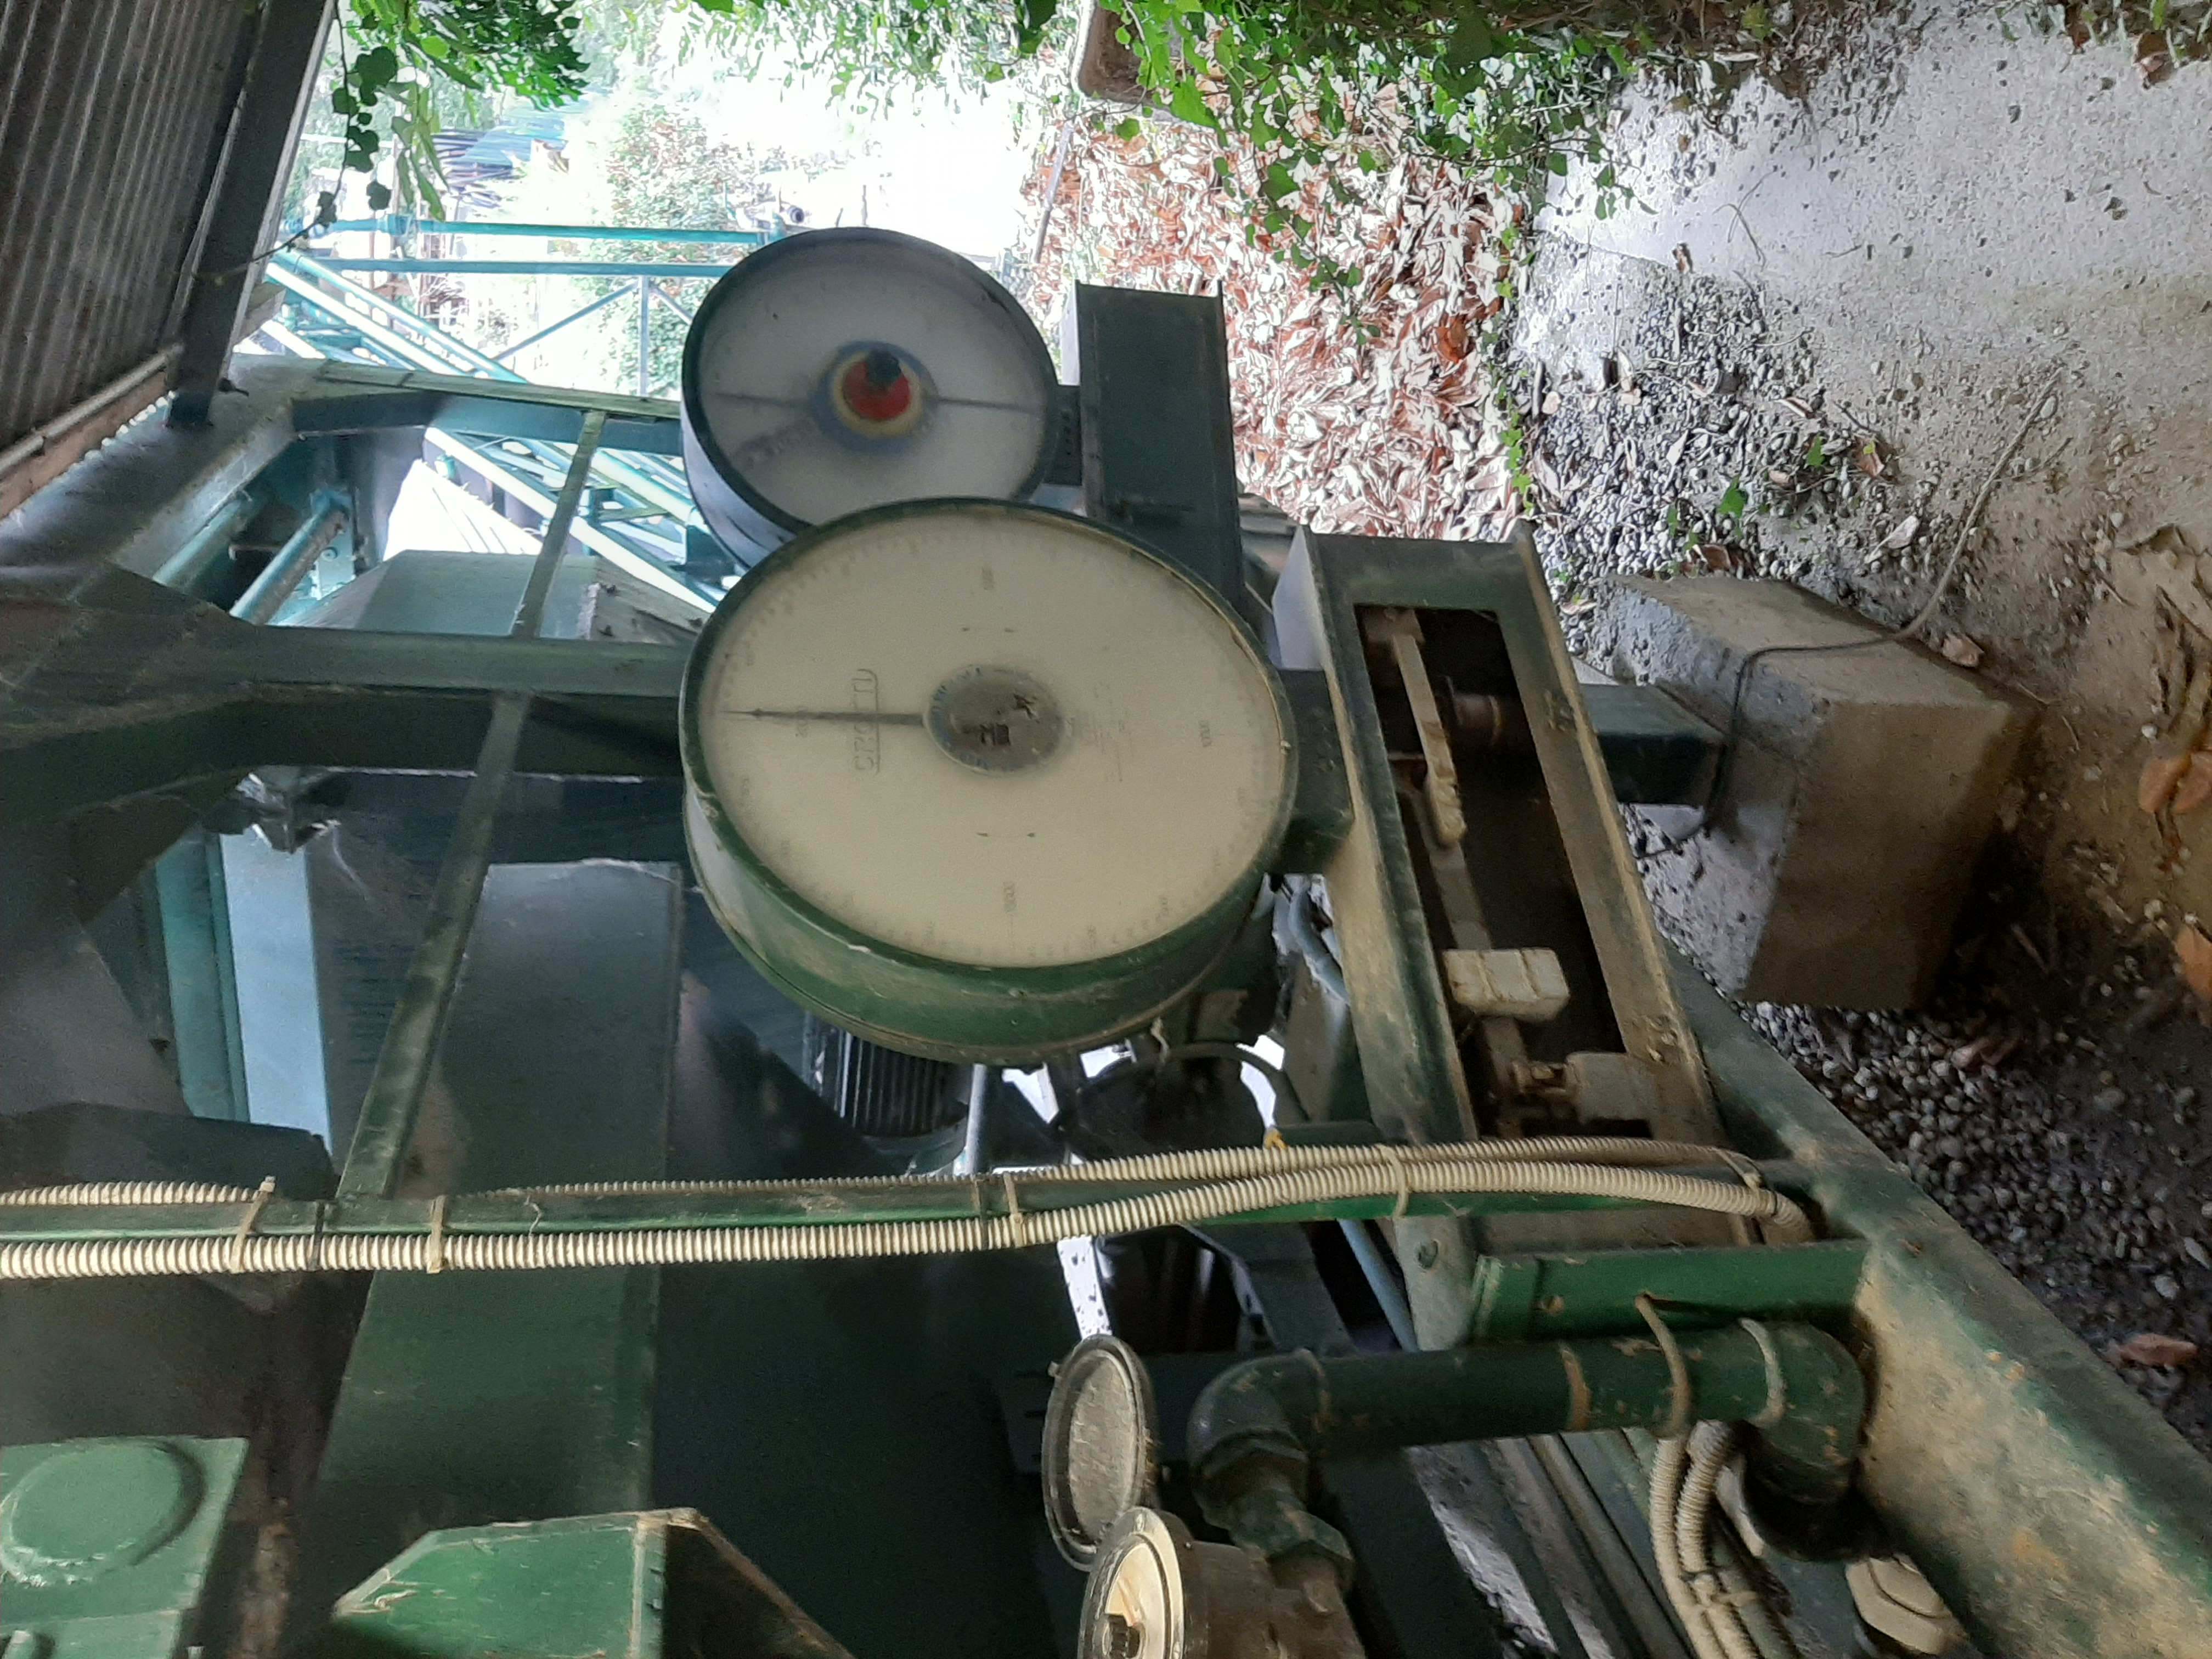 impianto betonaggio in vendita - foto 3